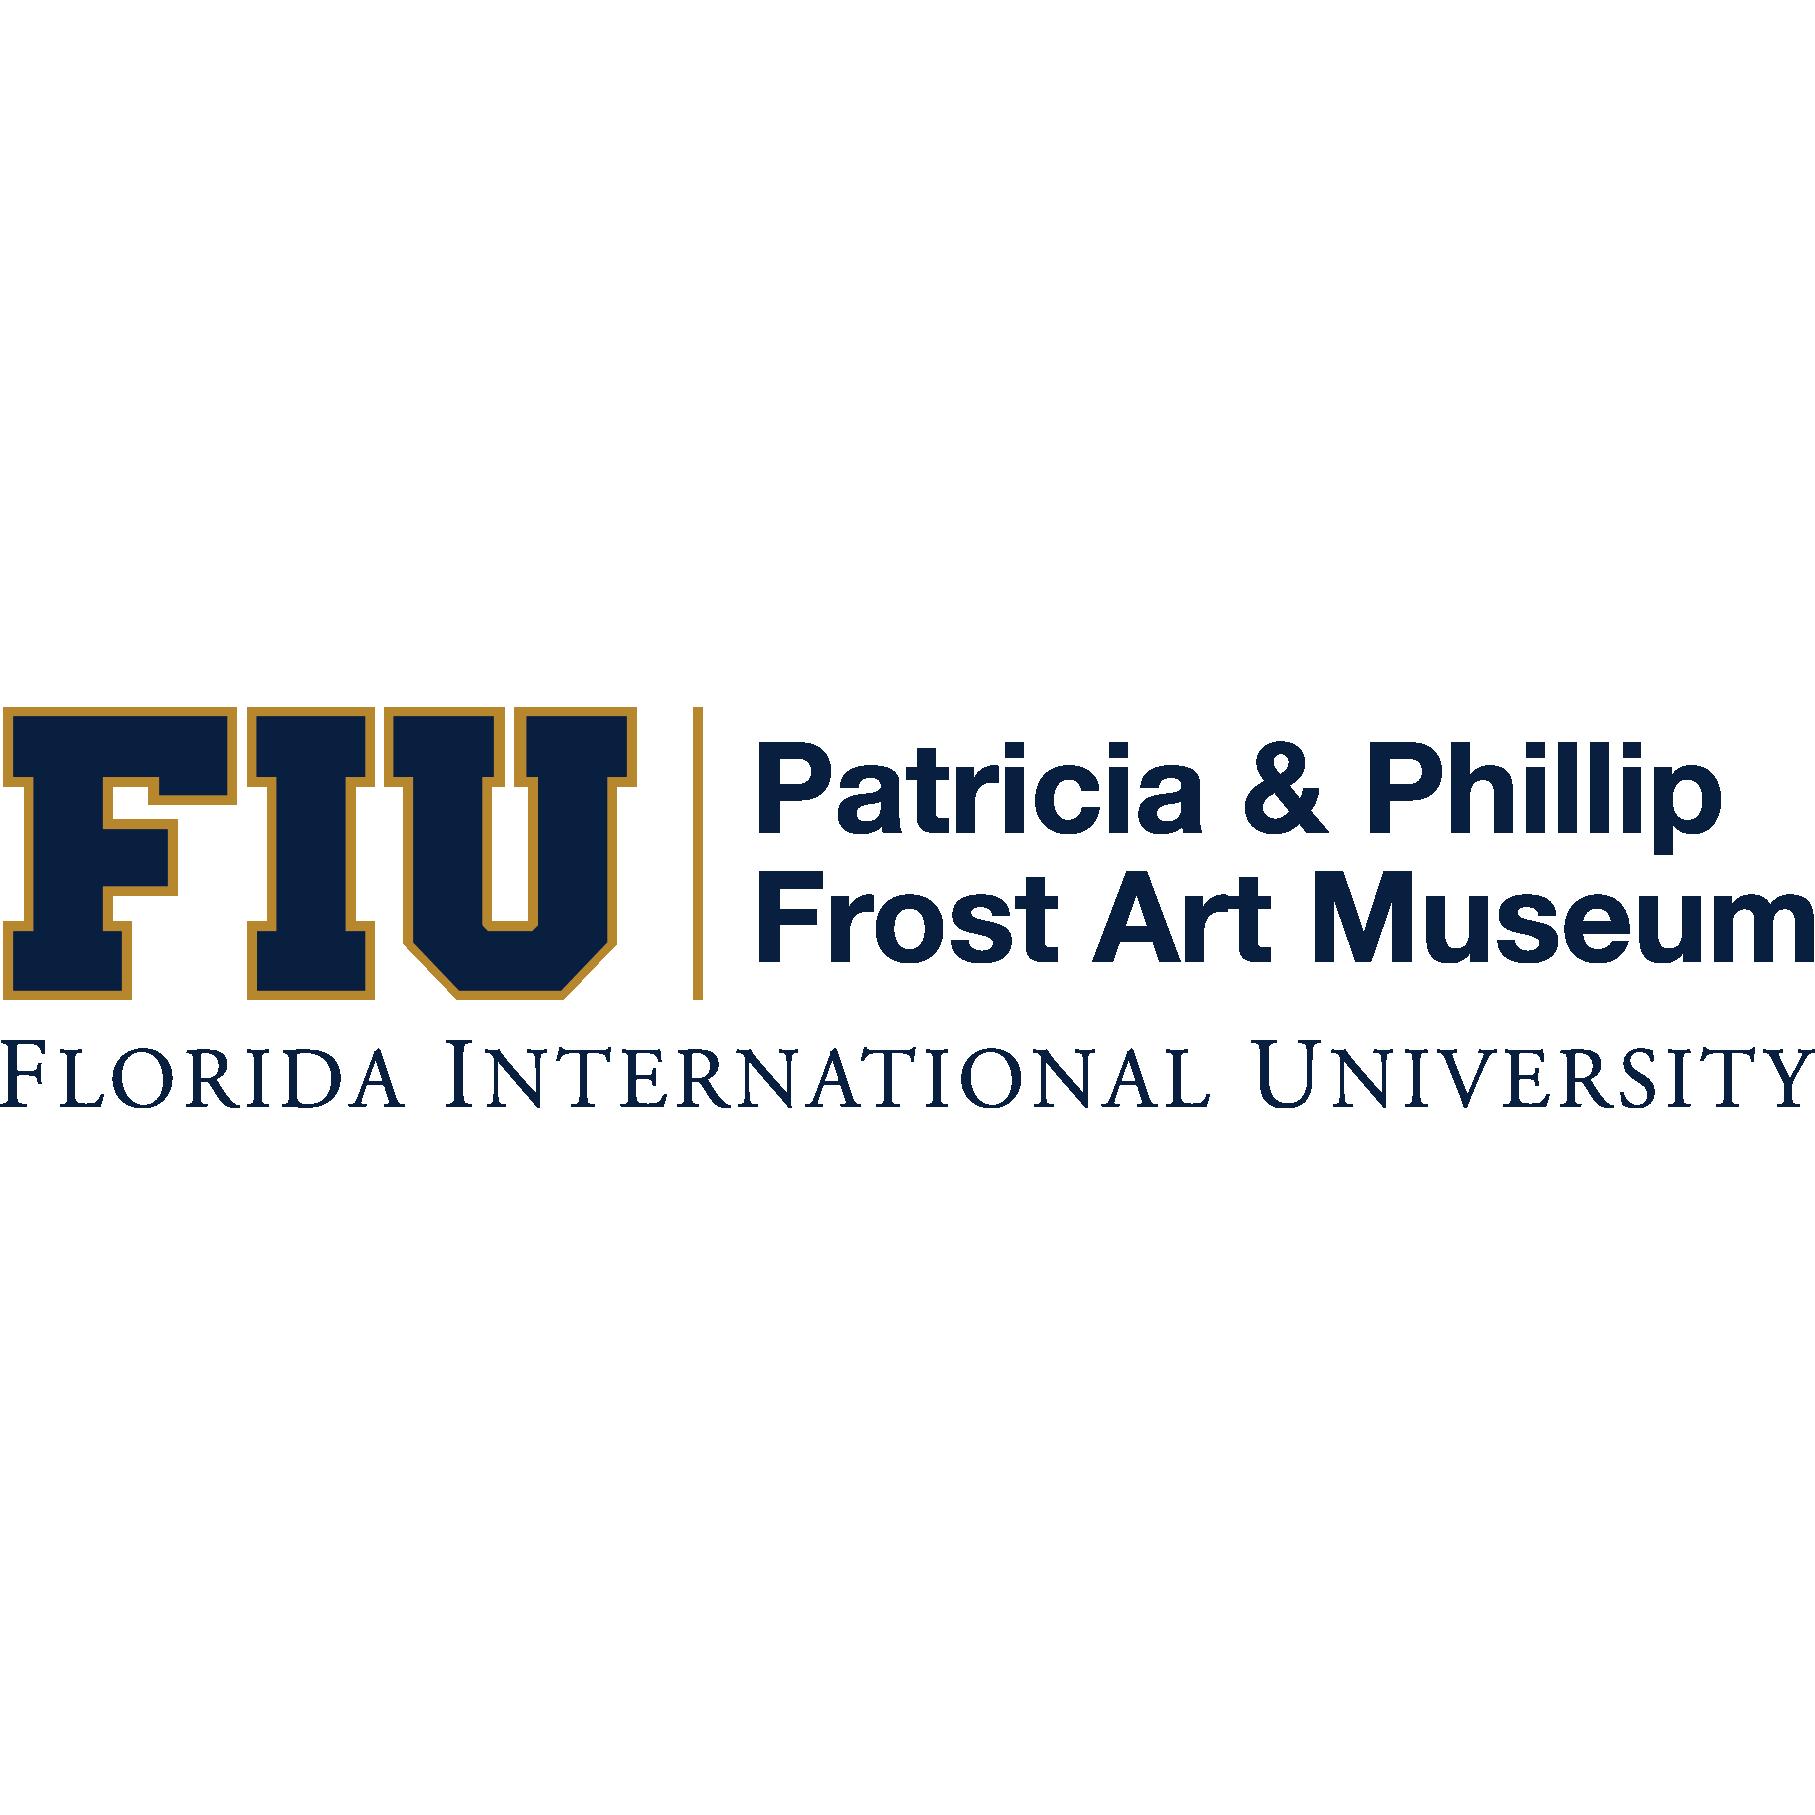 1.Frost-Art_Museum-hrz-FIU-Color.png